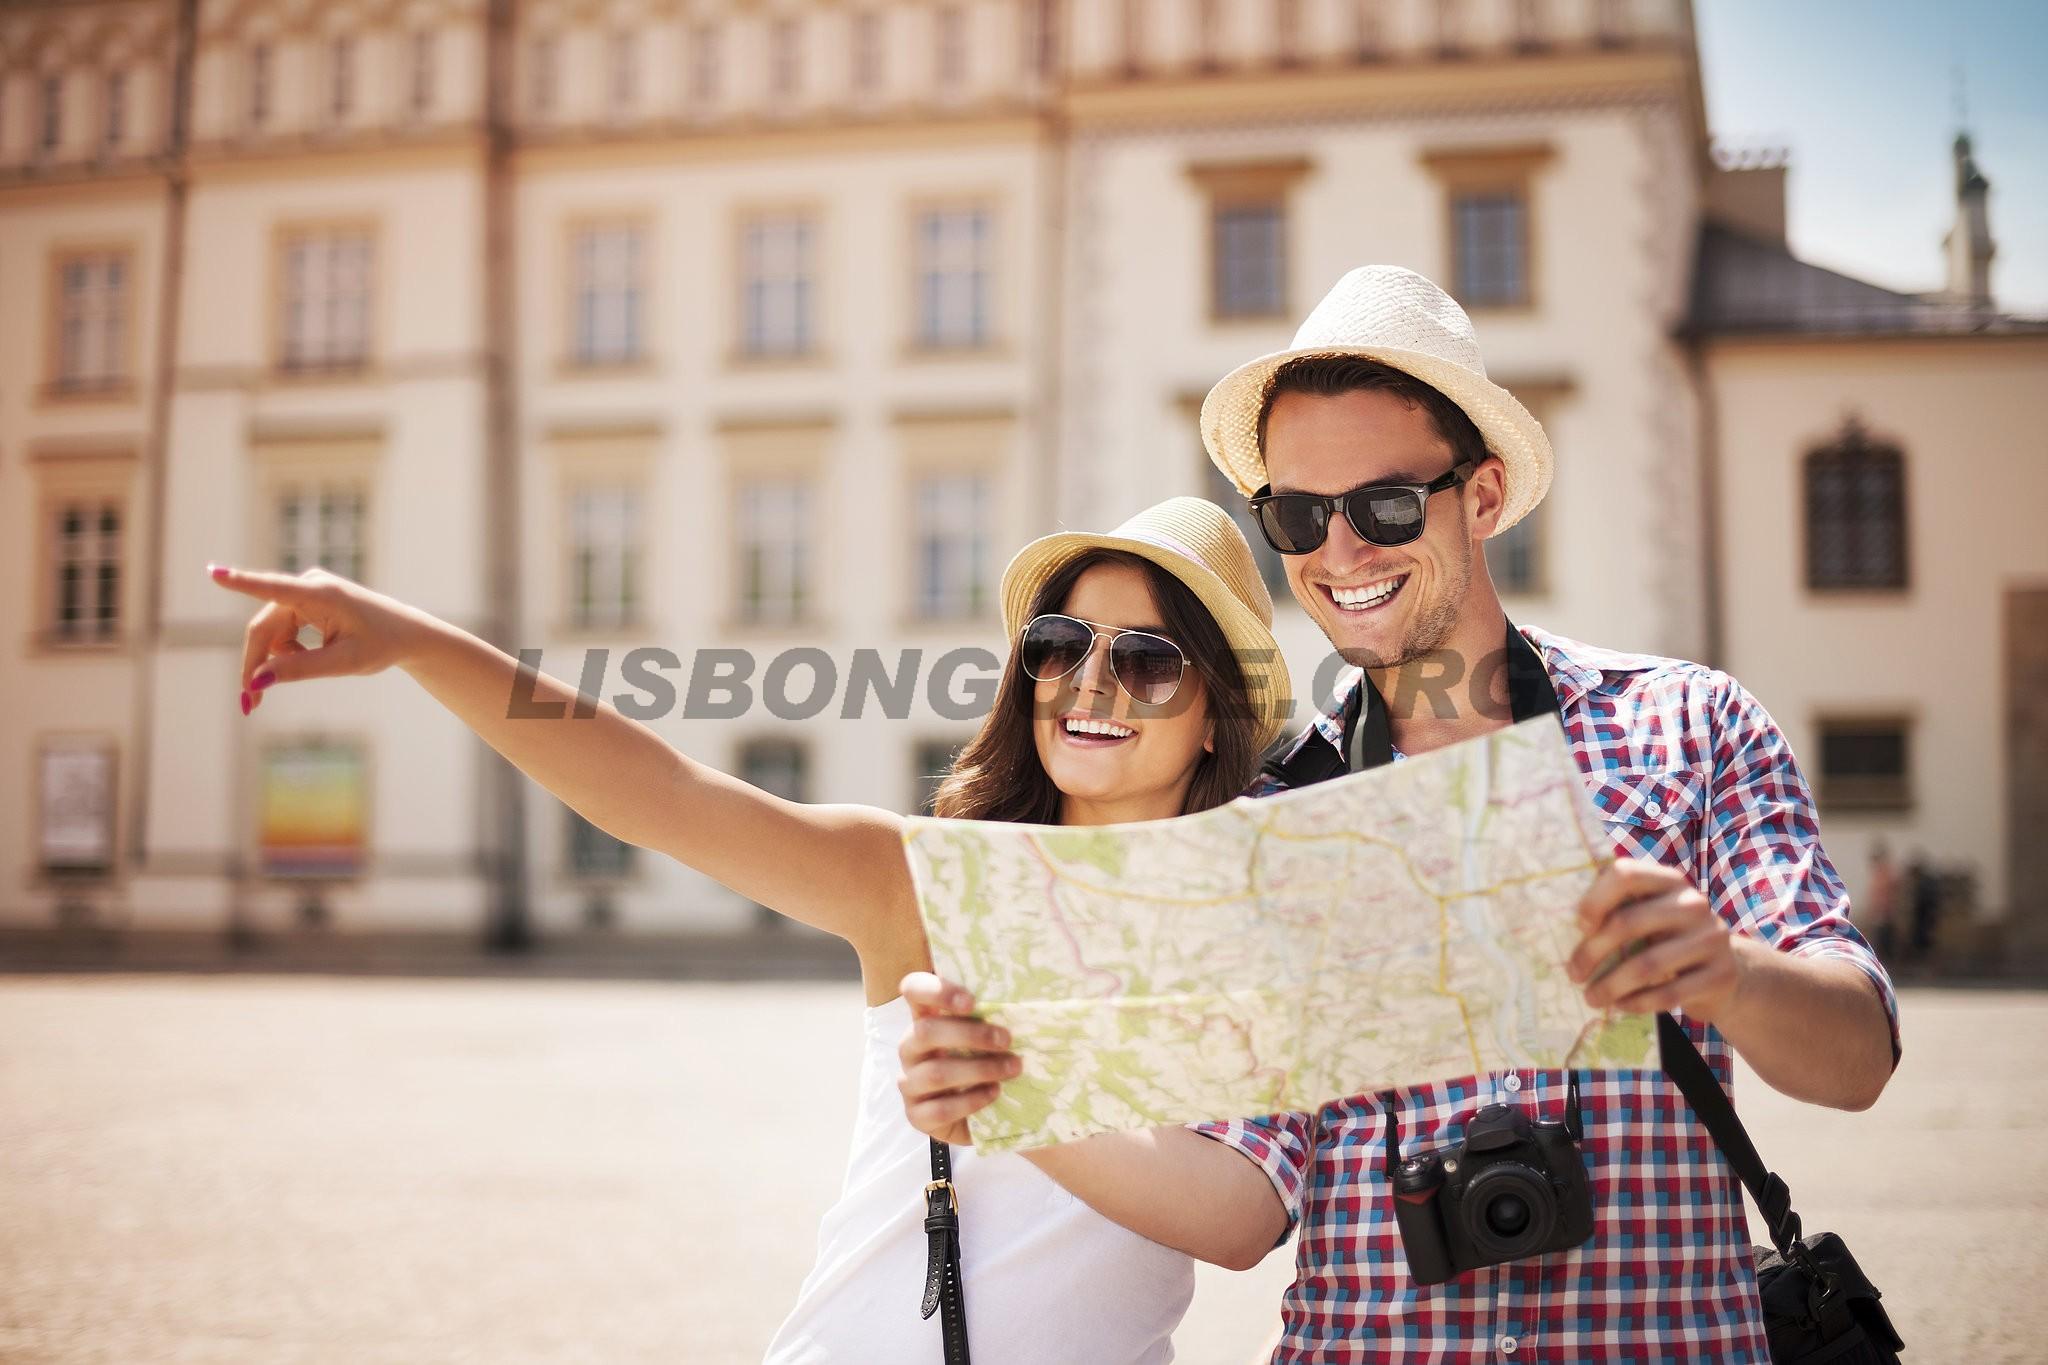 Lisbon_Free_Map